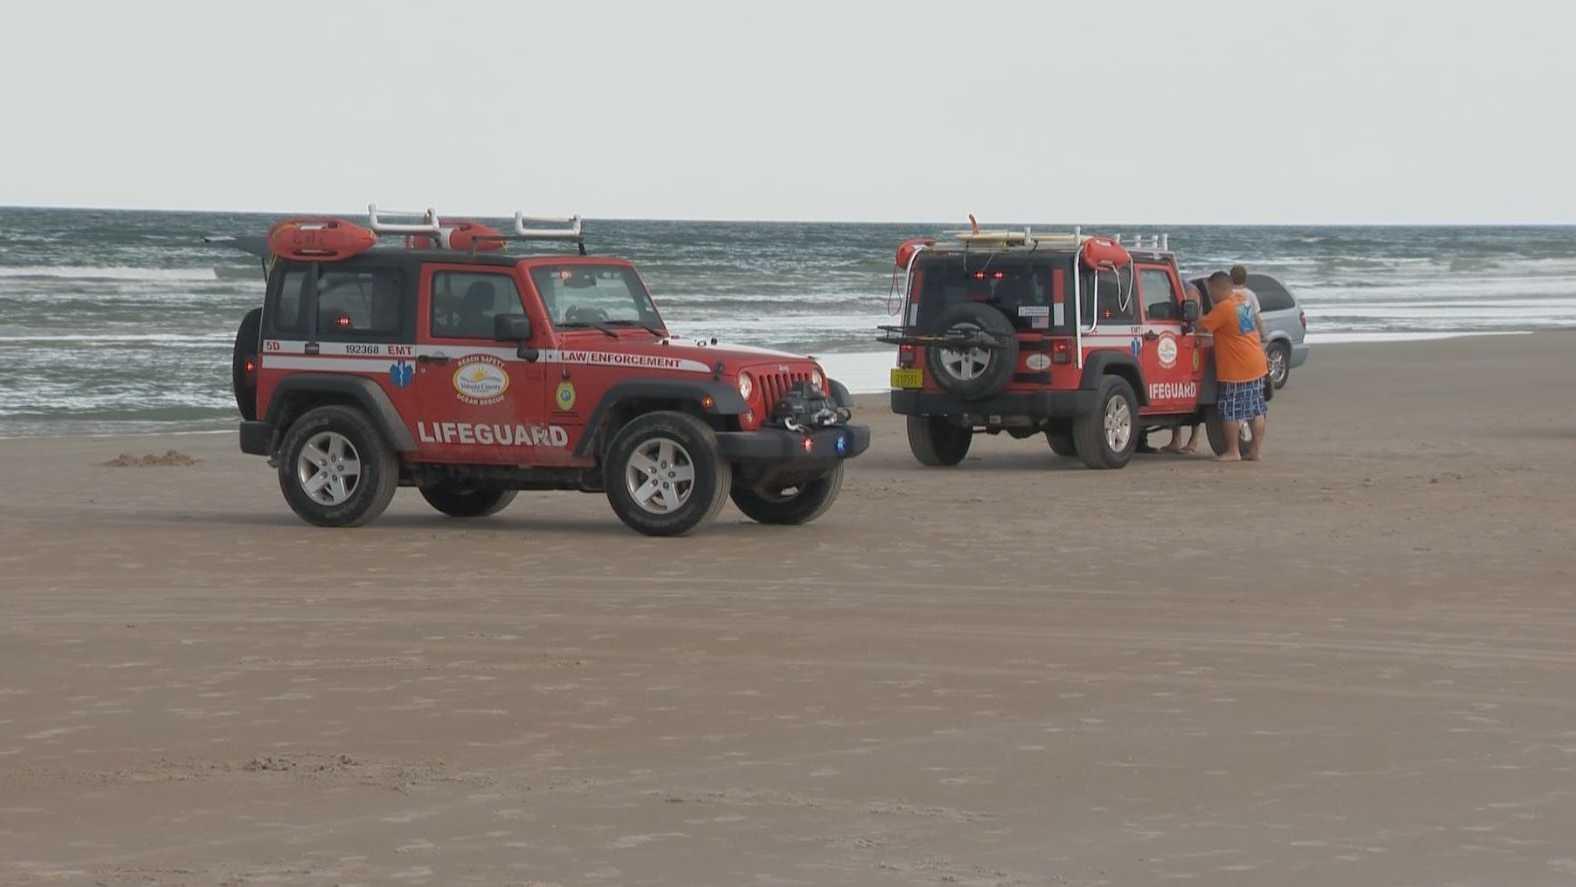 lifeguard jeeps.JPG